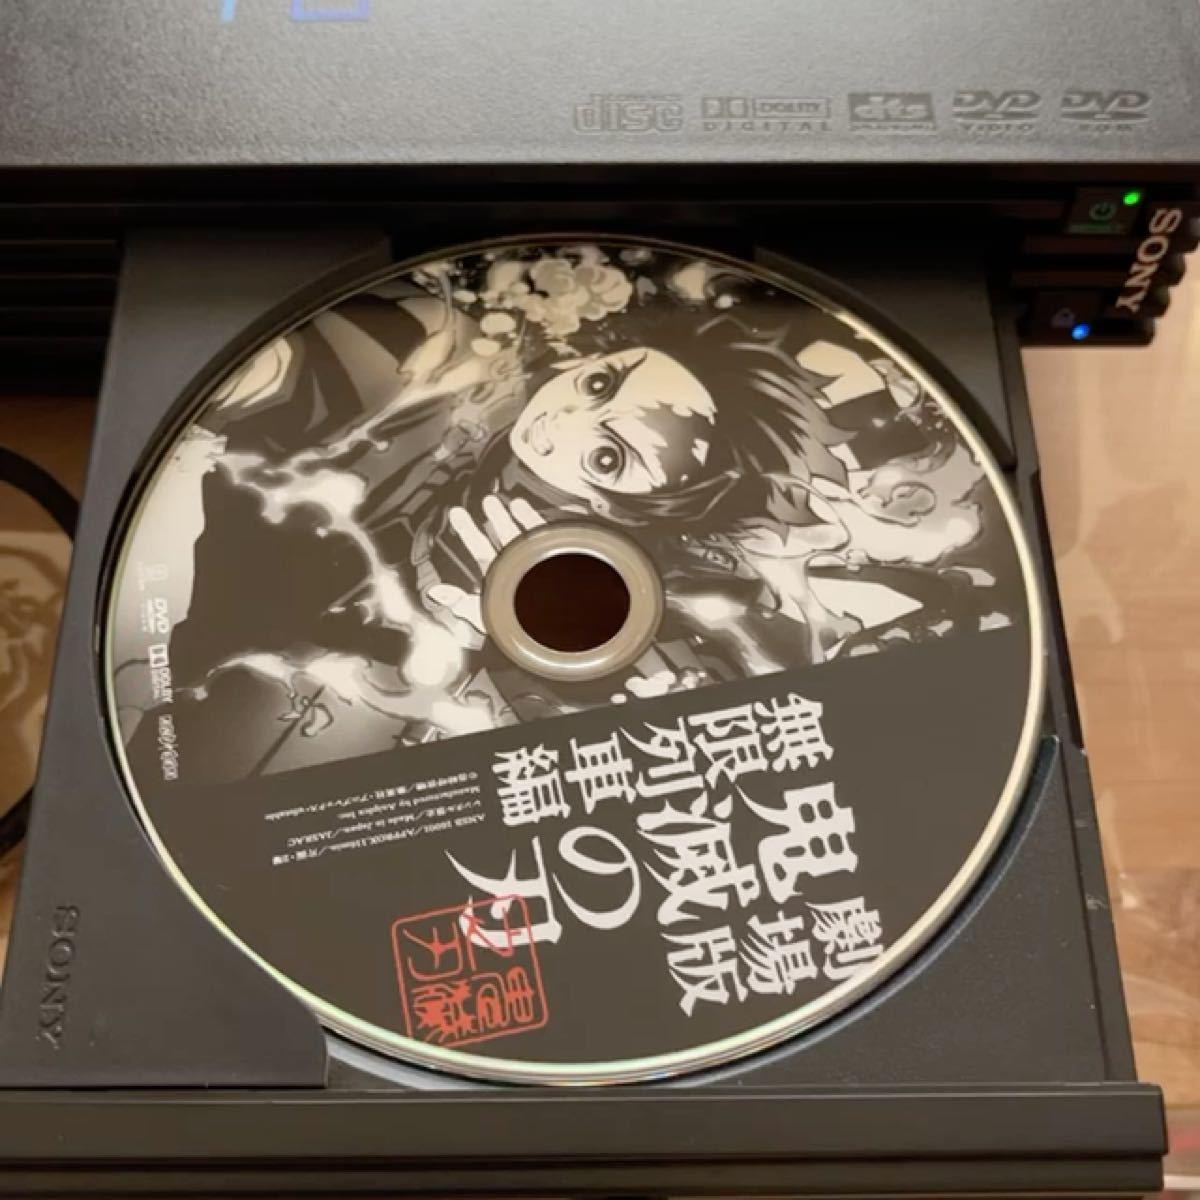 PS2 中古 説明書無し 箱キズ有り 動作未確認 SCPH-30000